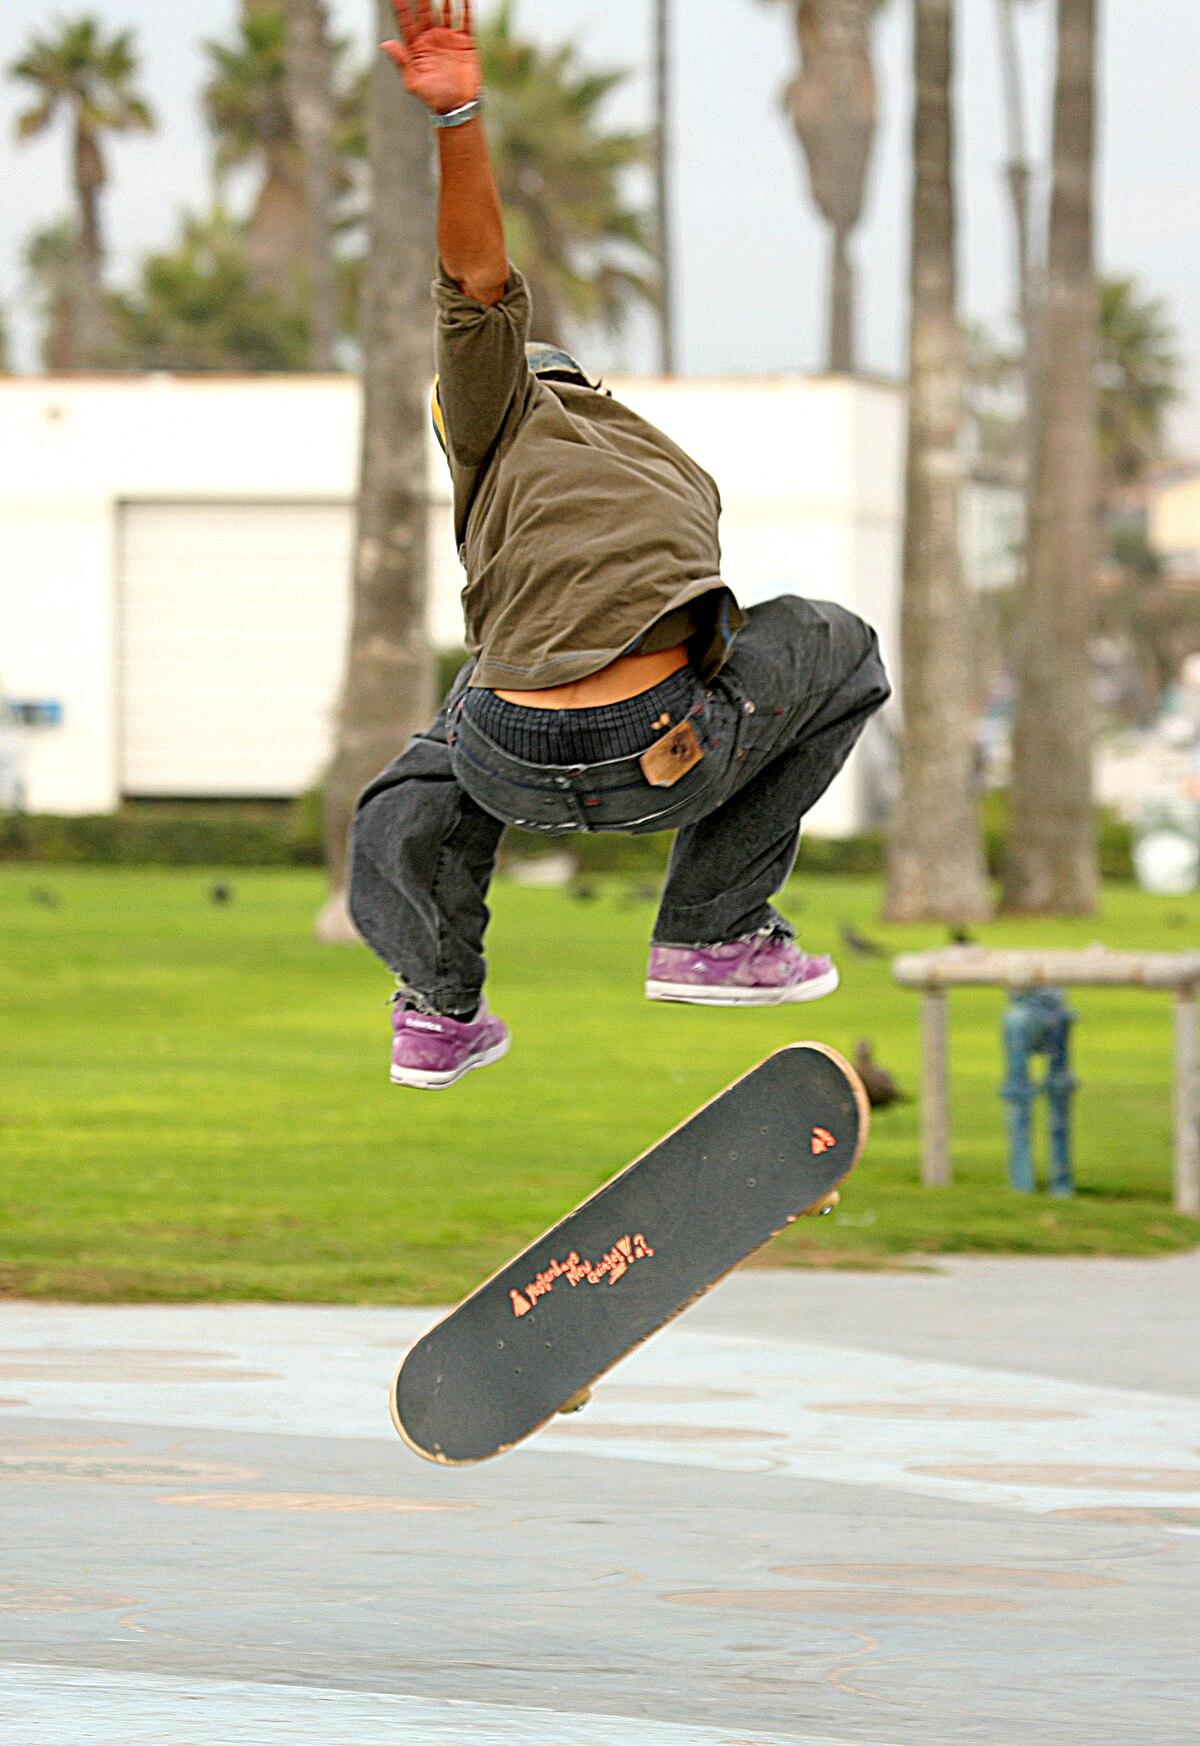 Penny Skateboards Girl Wallpaper Skateboard Wikipedia